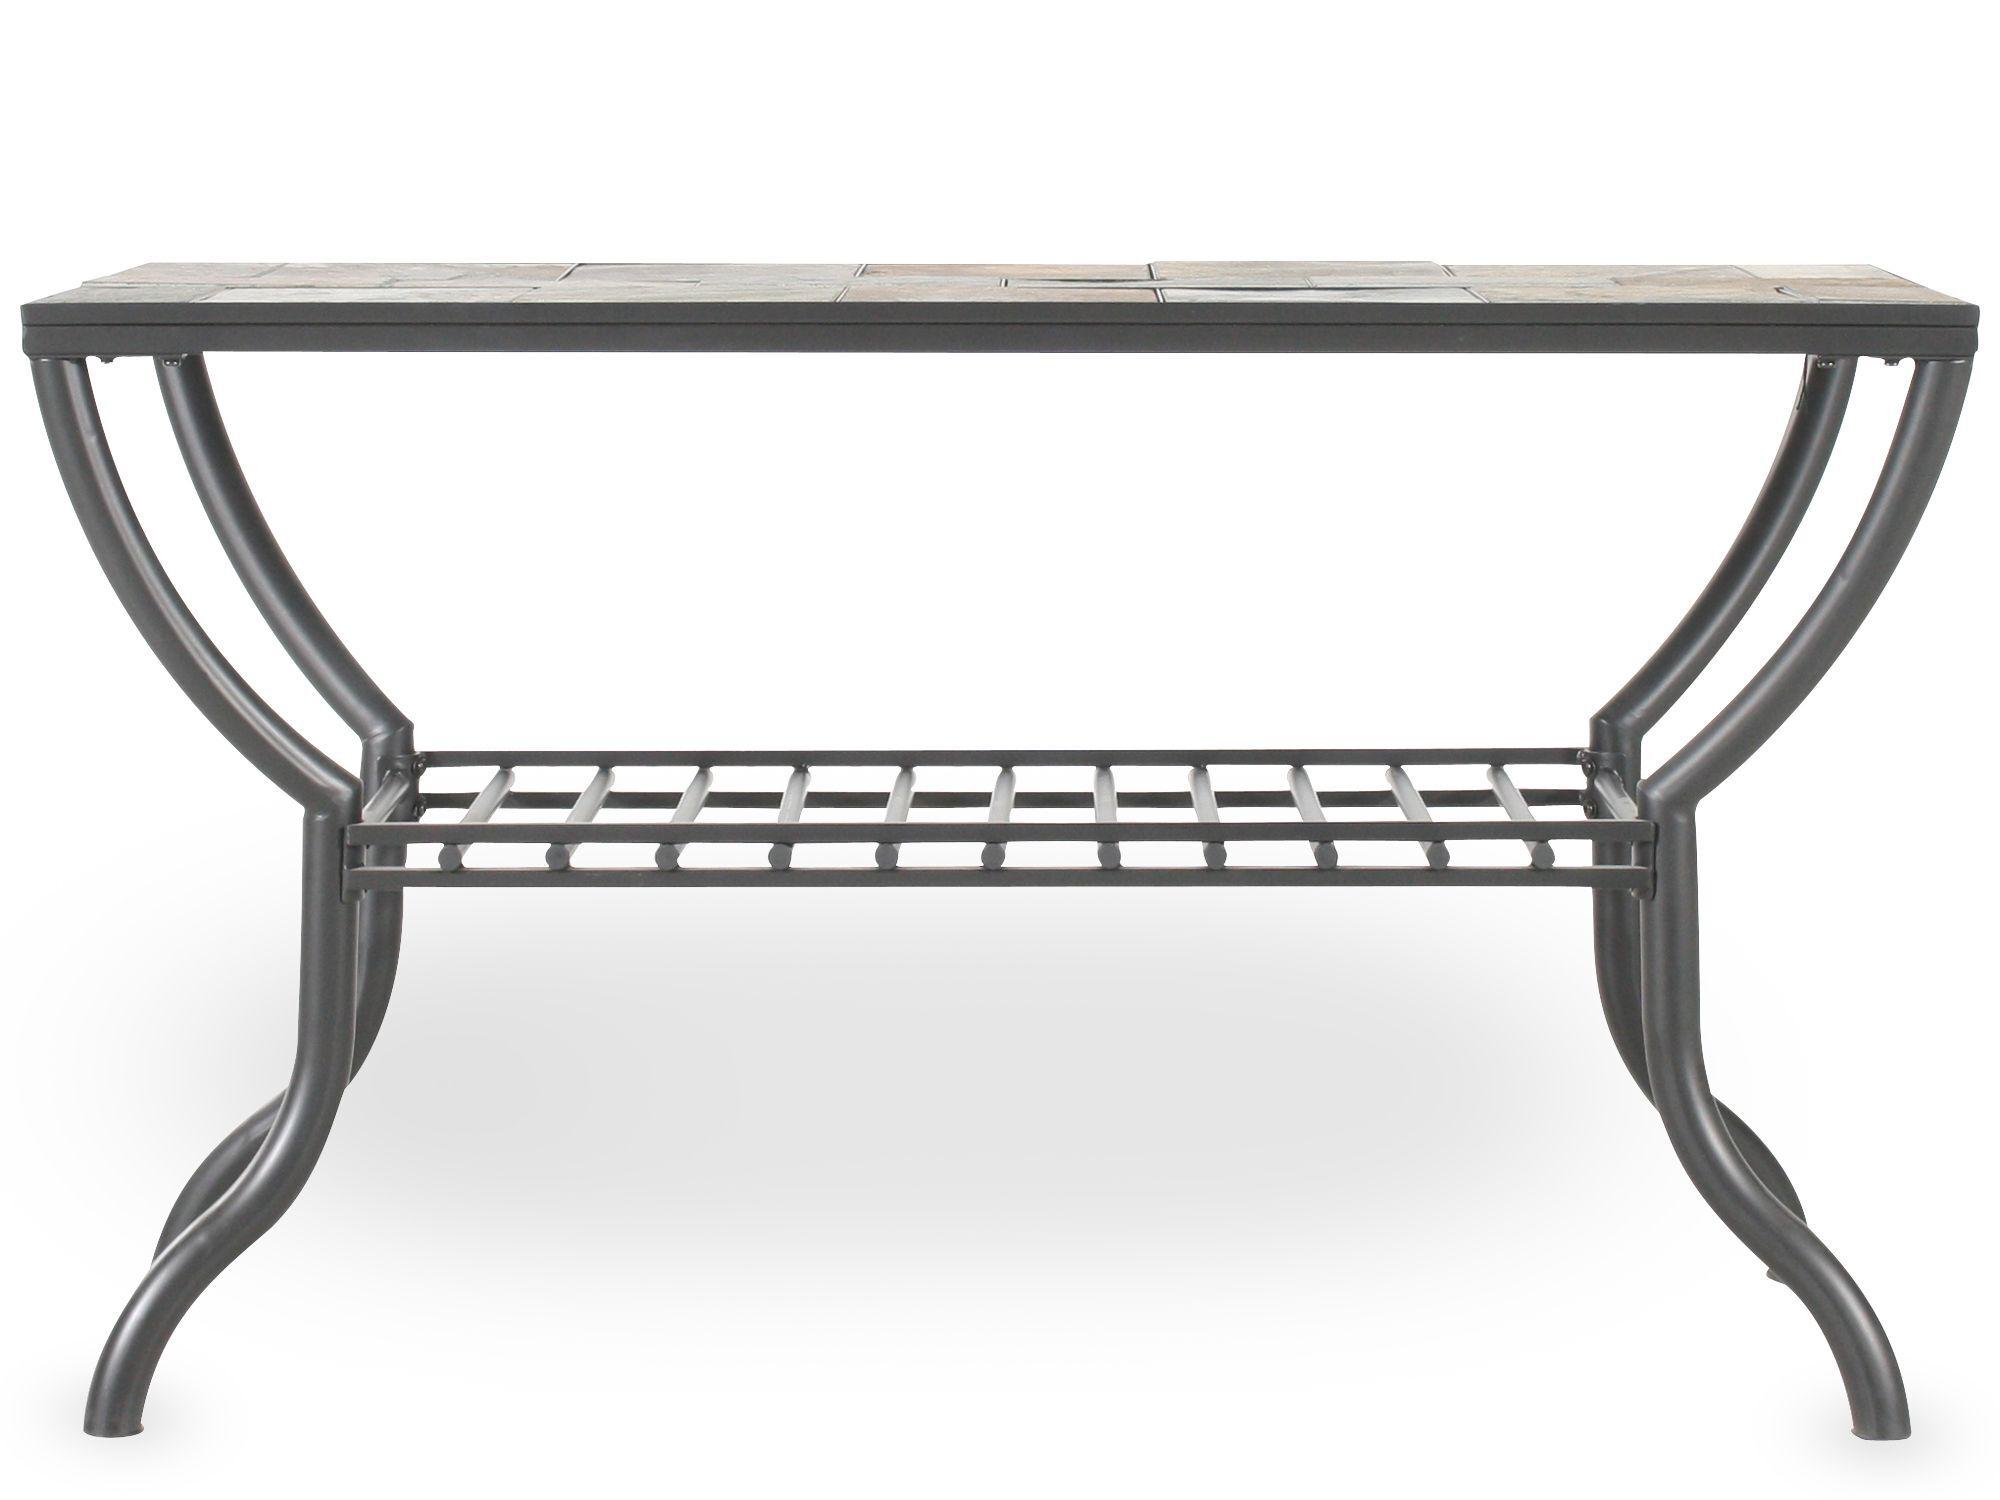 Grilled Shelf Contemporary Sofa Table In Gun Metal